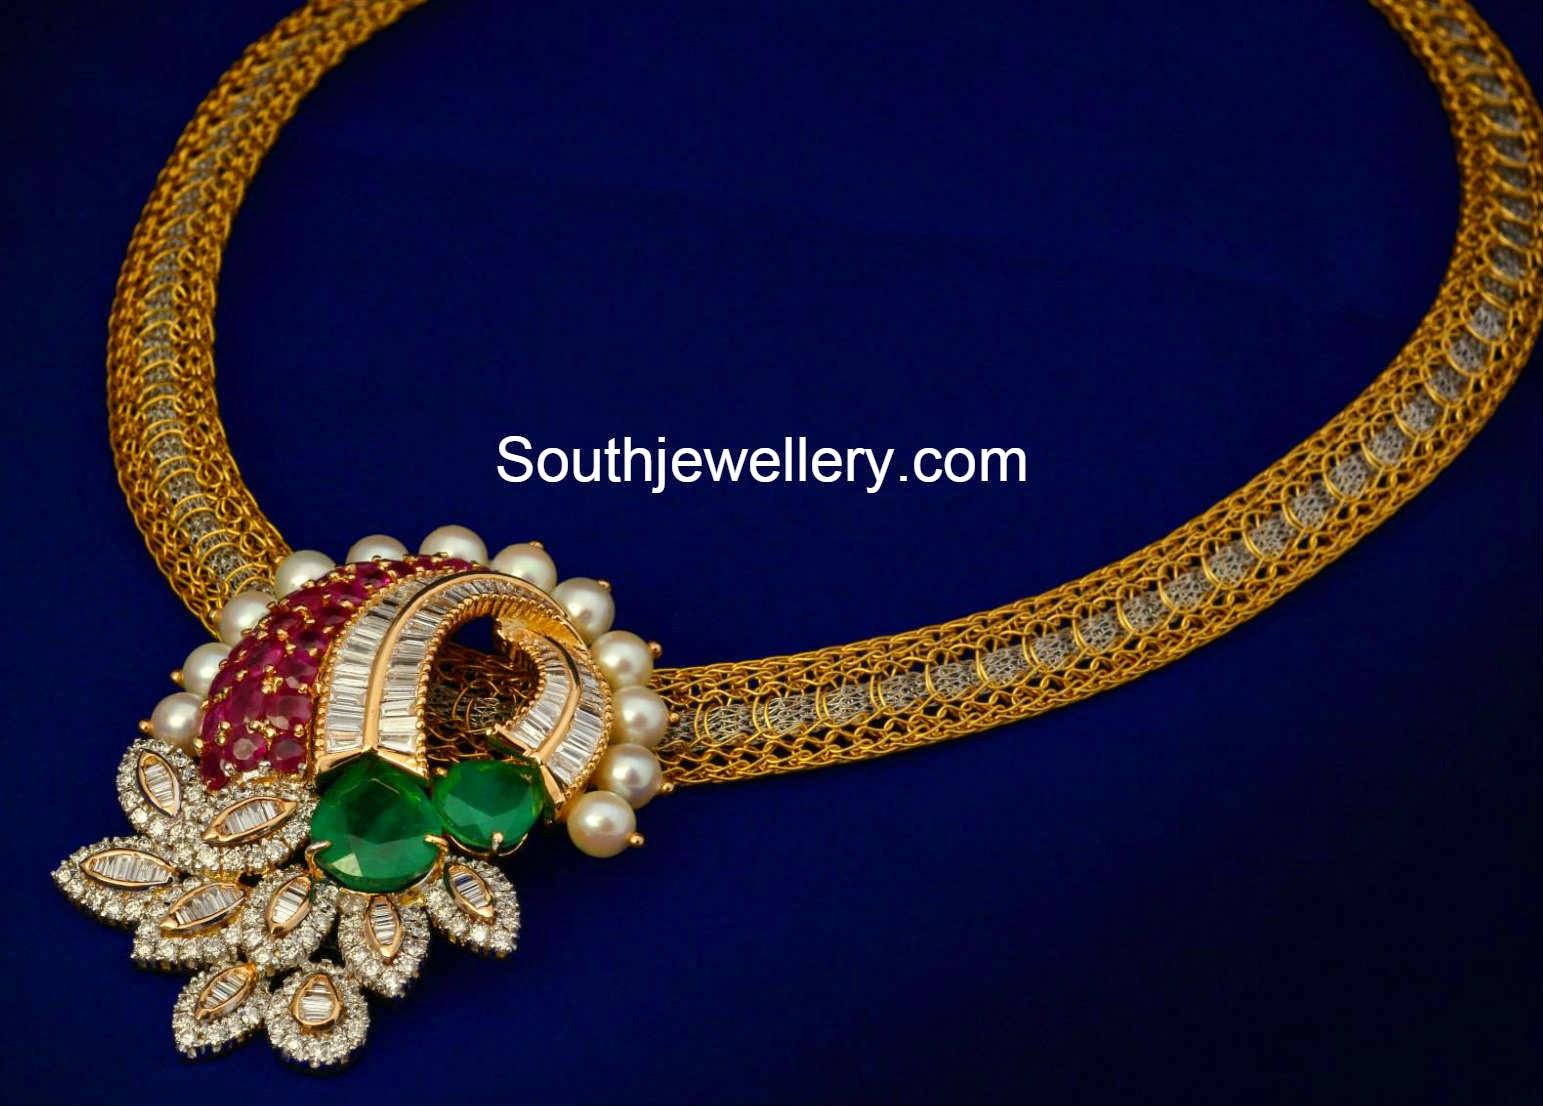 Suhasini in gundla haram jewellery designs - Gold Chain With Diamond Pendant